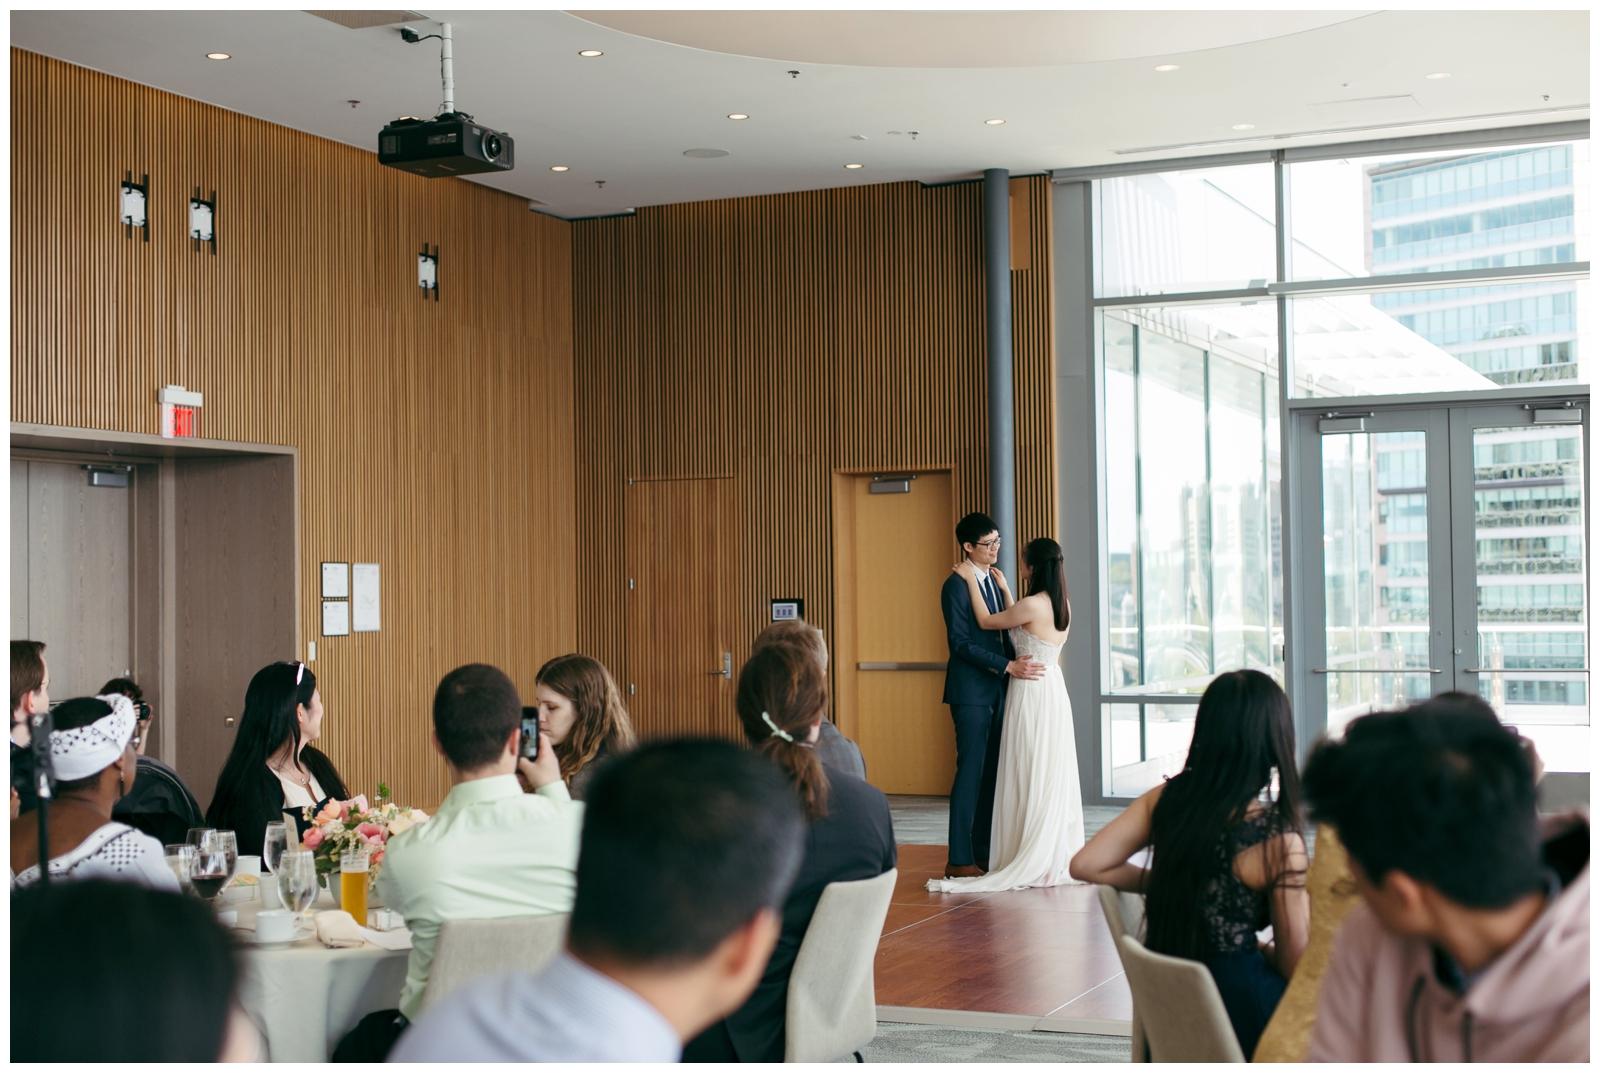 Samberg-Conference-Center-Boston-Wedding-Photographer-Bailey-Q-Photo-096.jpg